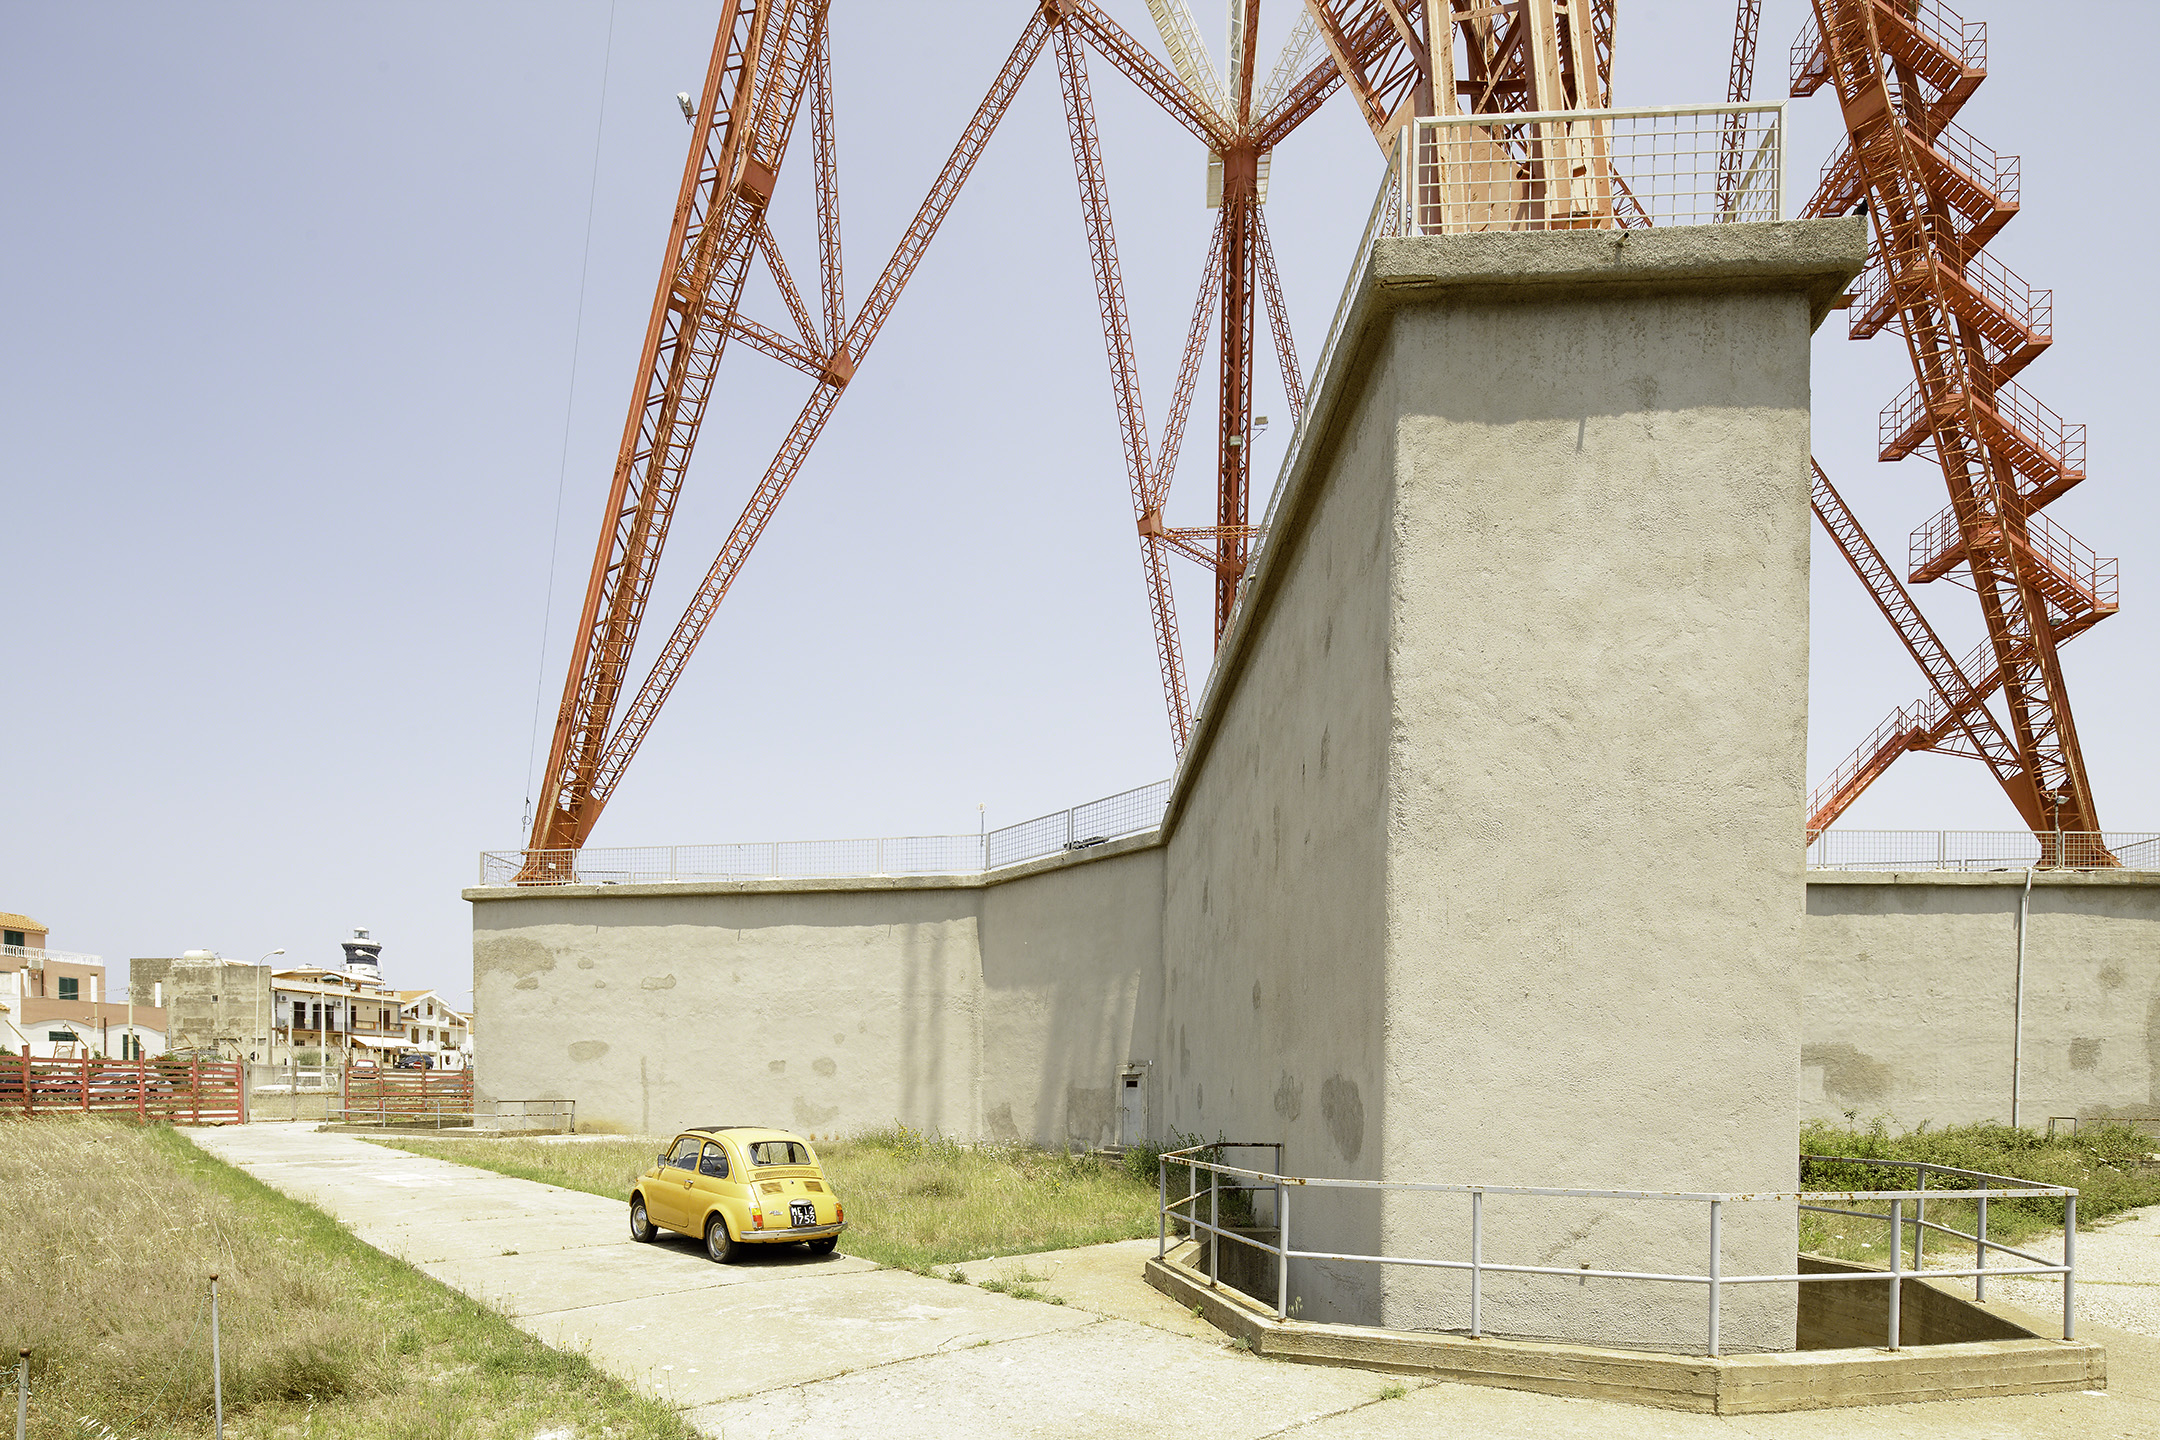 10-Torre-Faro-90x60cm-MattePaper-Sharpened.jpg